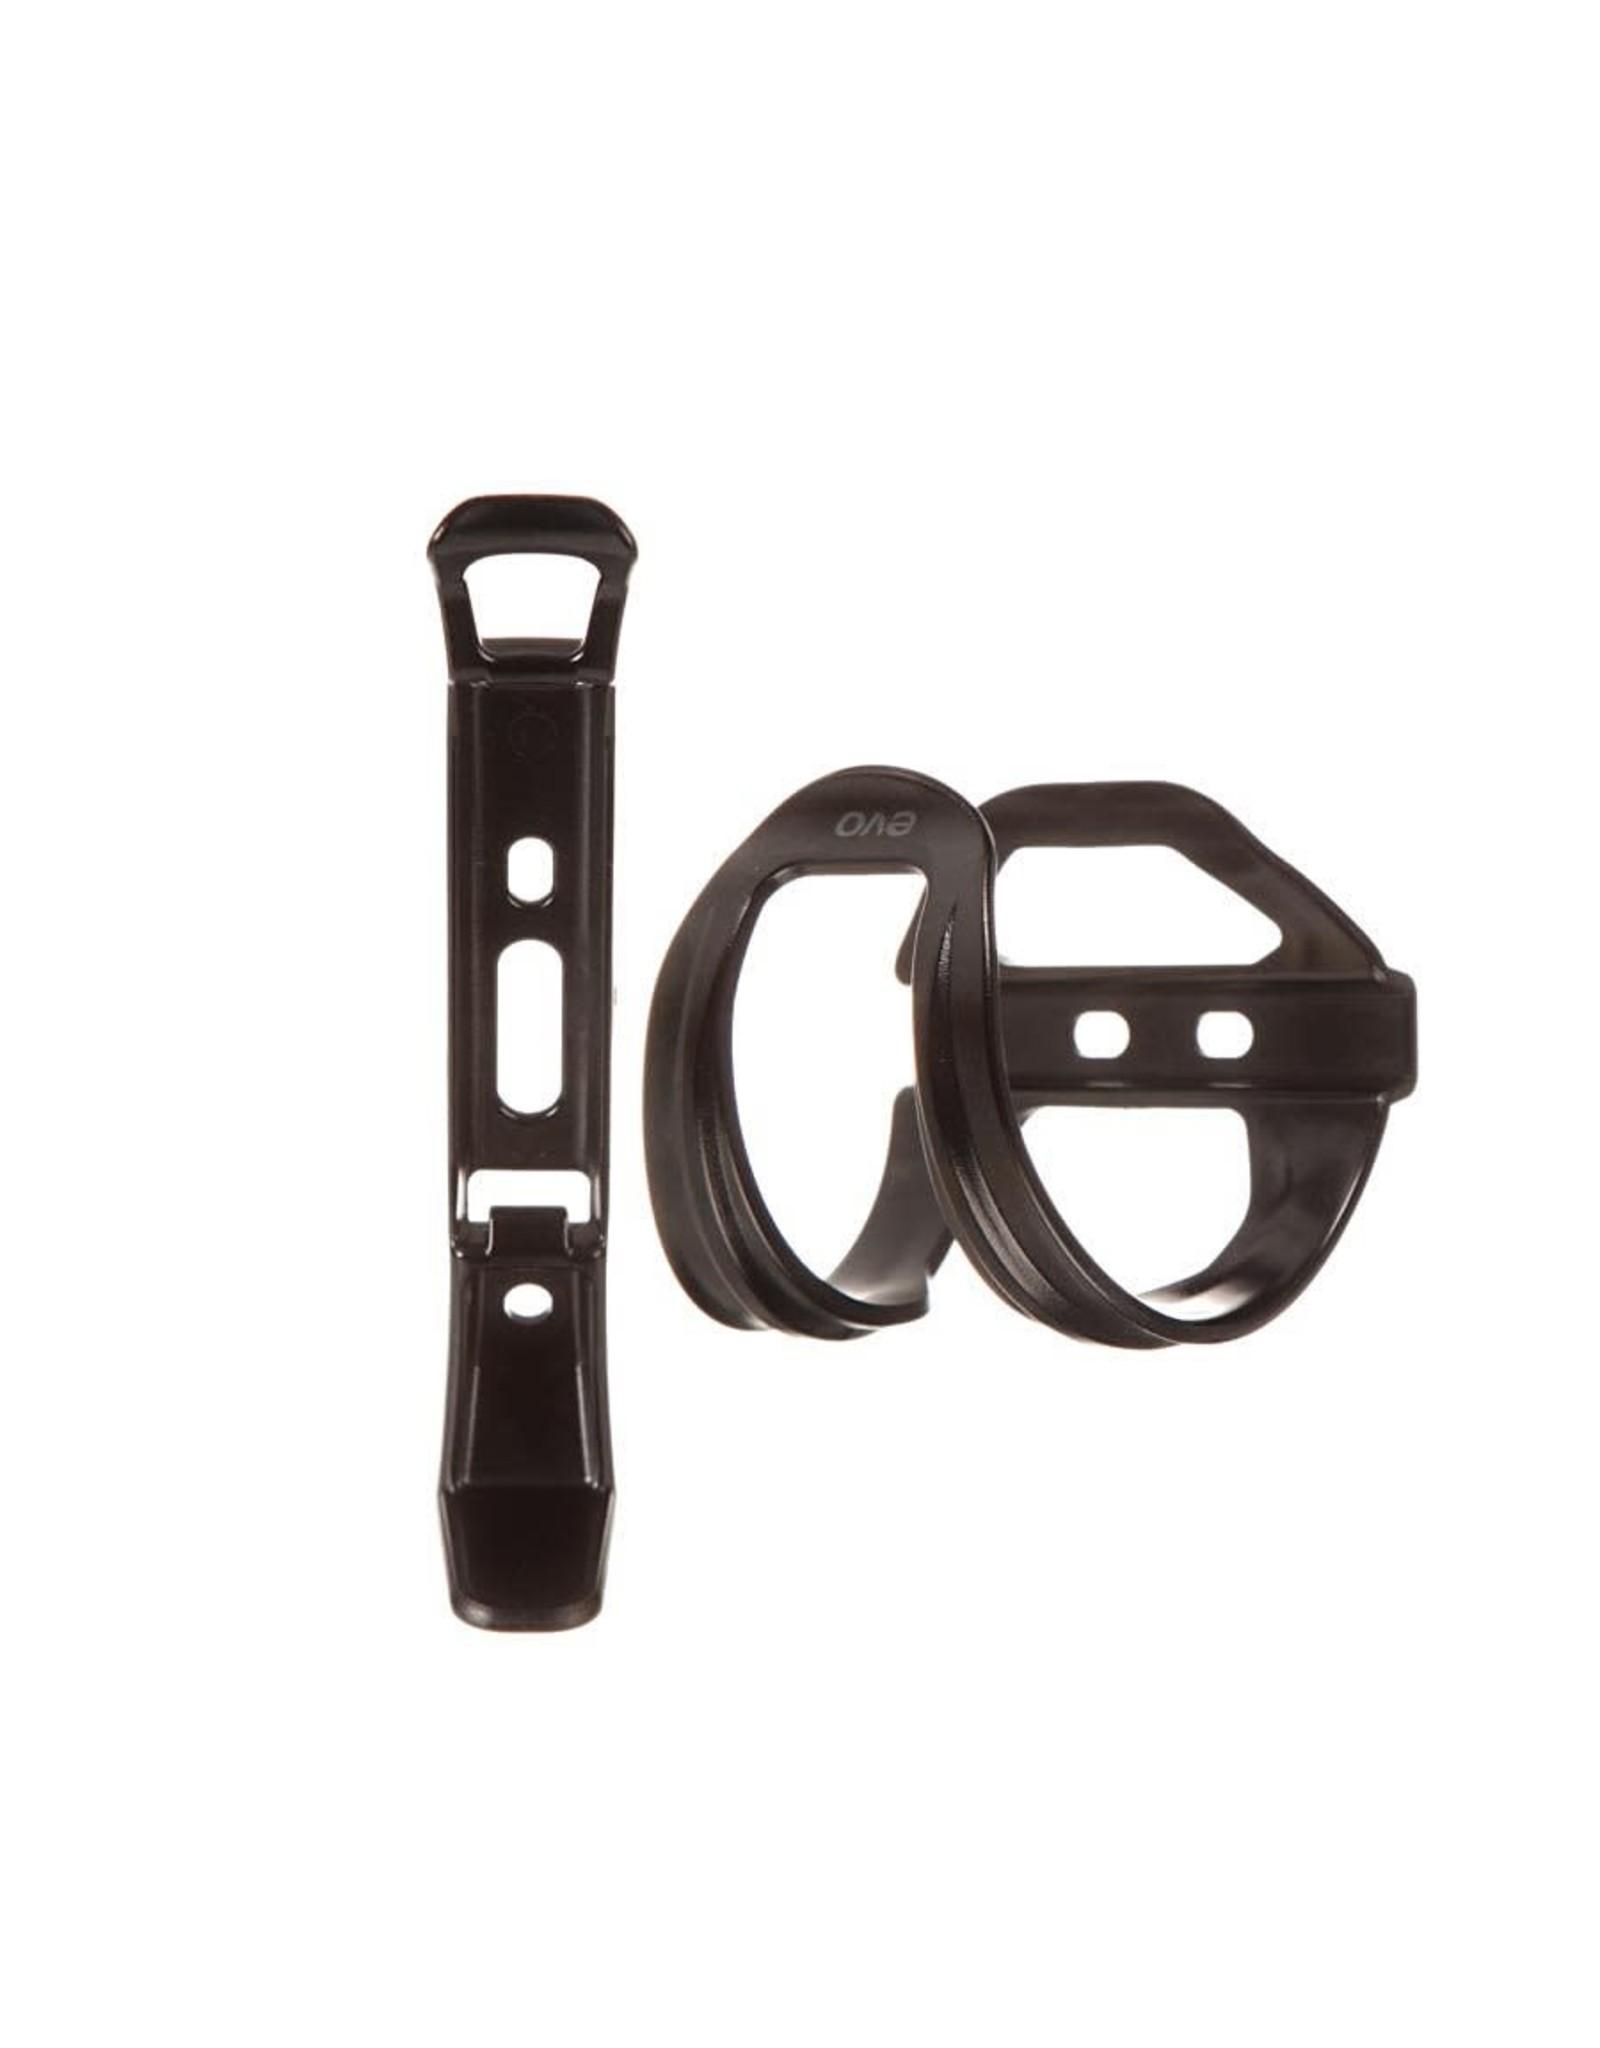 EVO, SideSwipe L/R Comp, Porte-Bidon, Composite, Noir, 50g